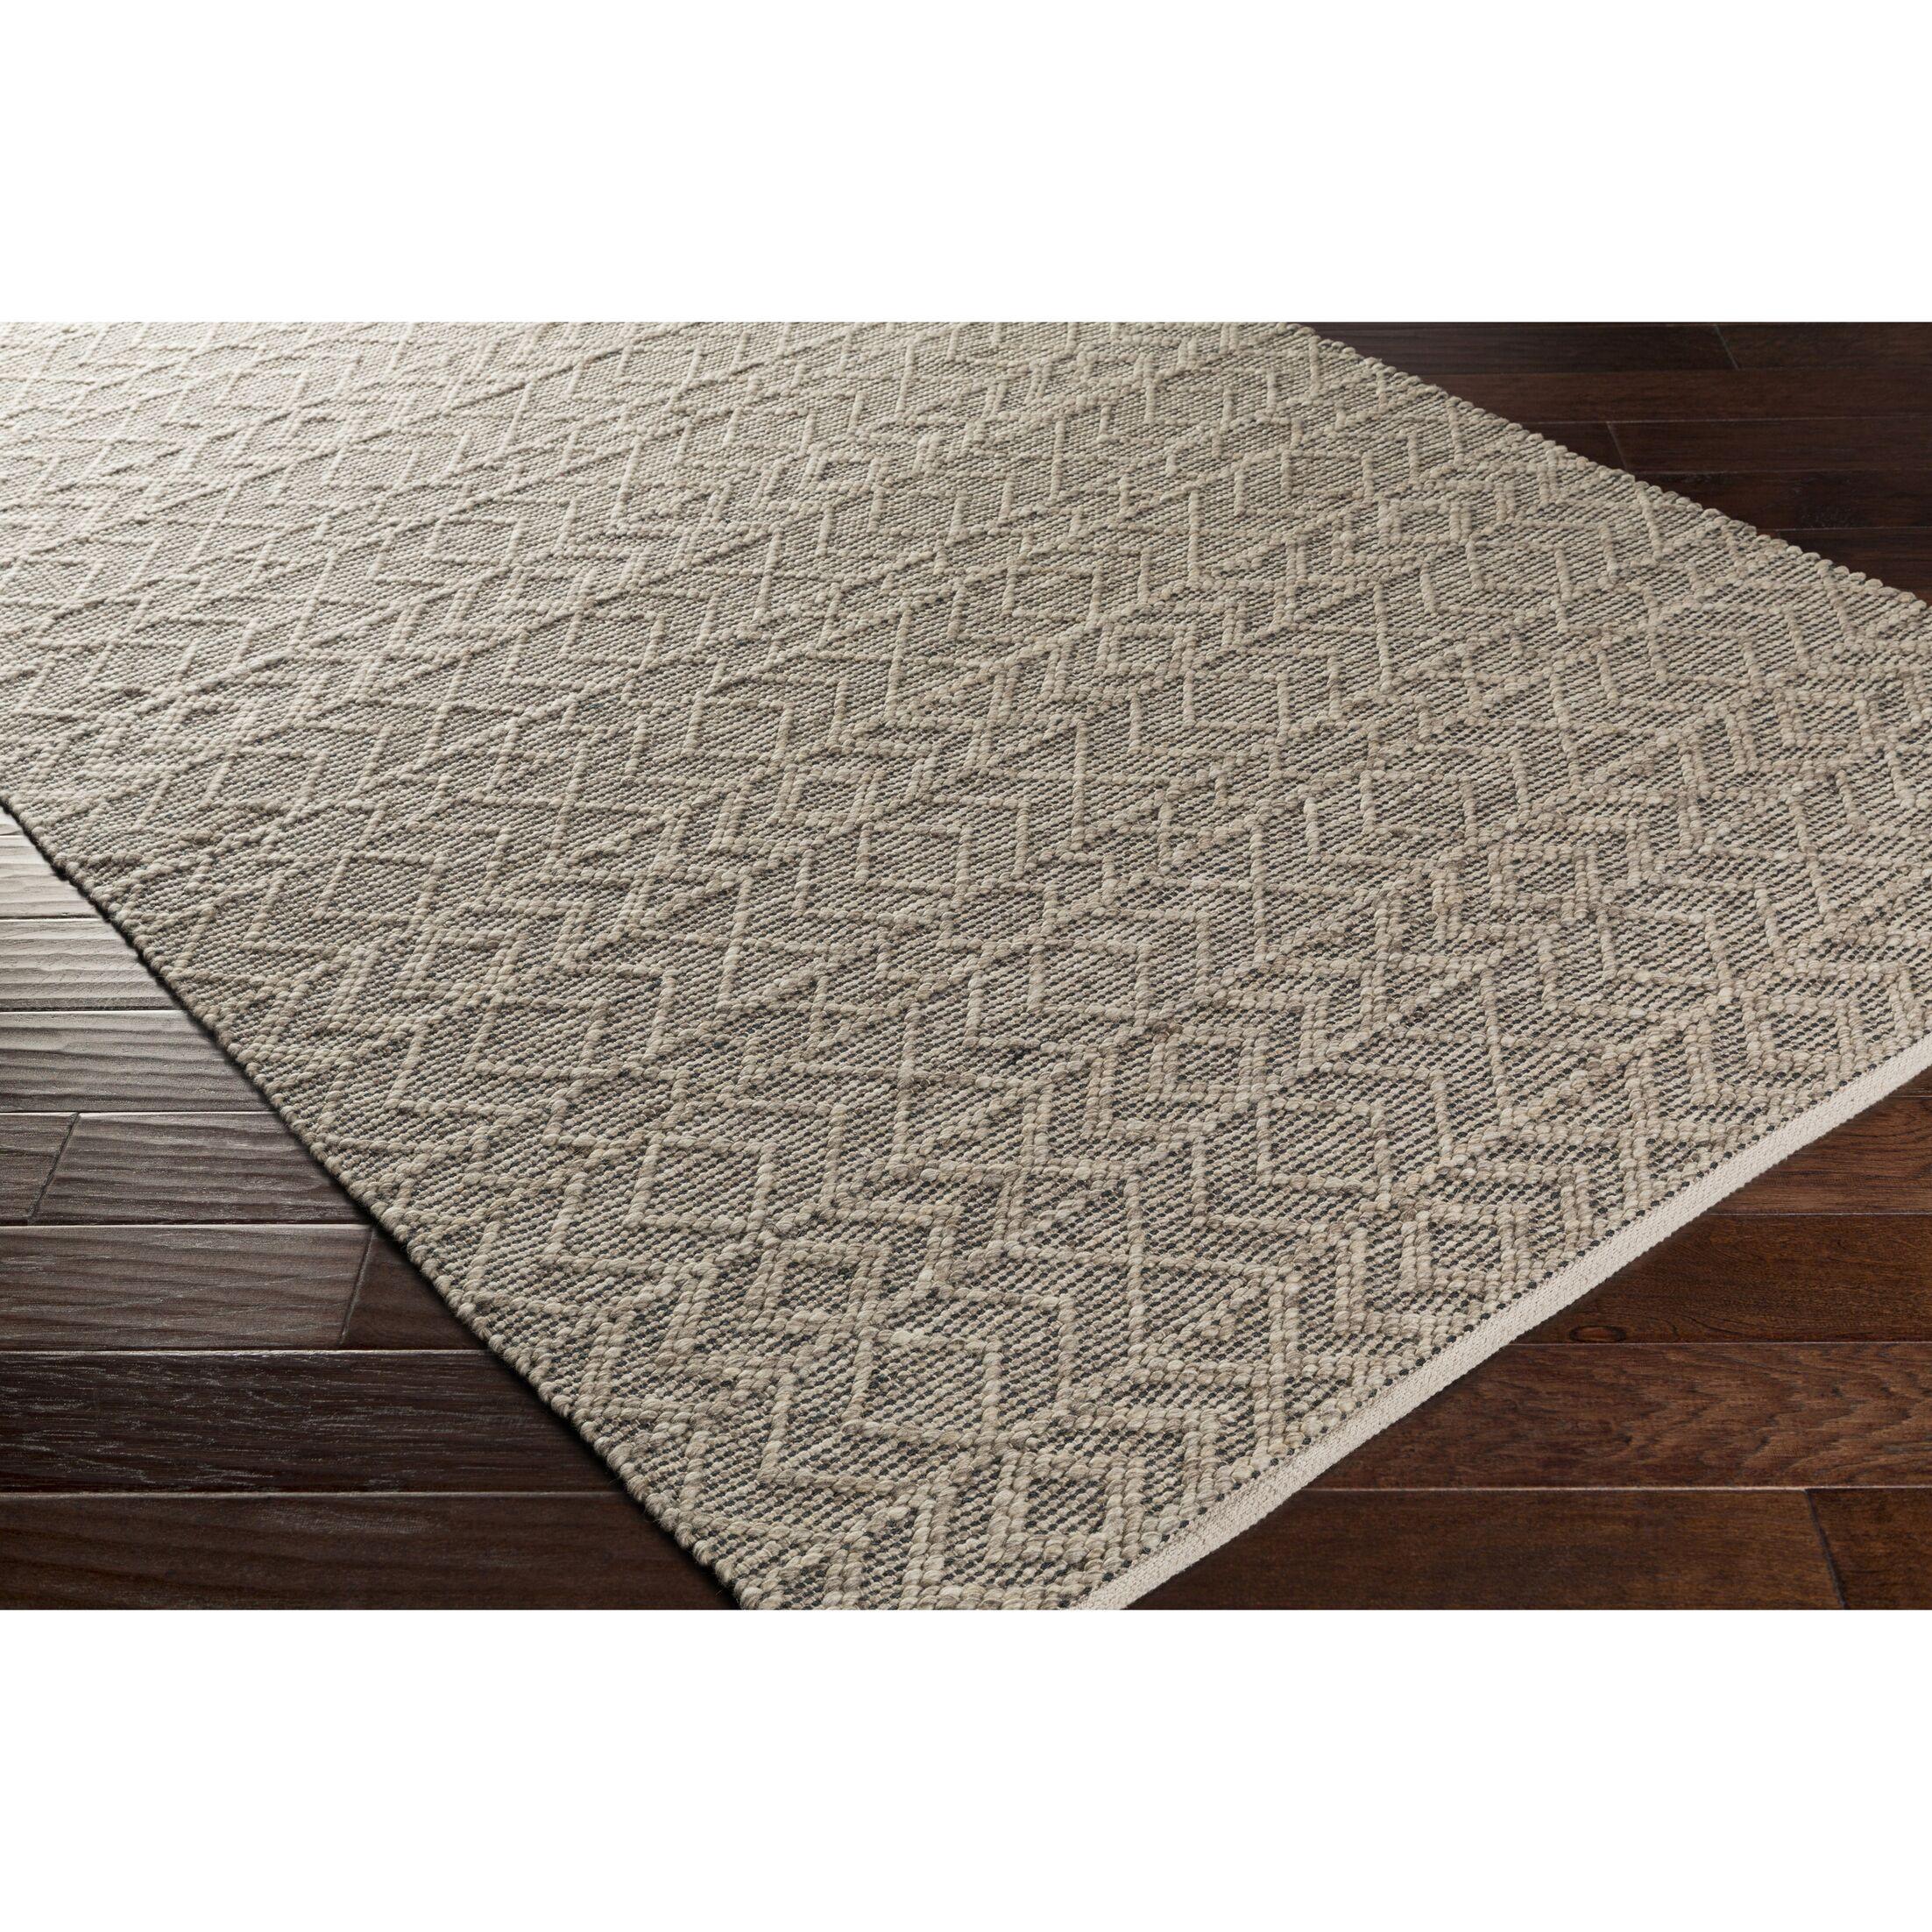 Between Hand-Woven Gray Area Rug Rug Size: Rectangle 4' x 6'